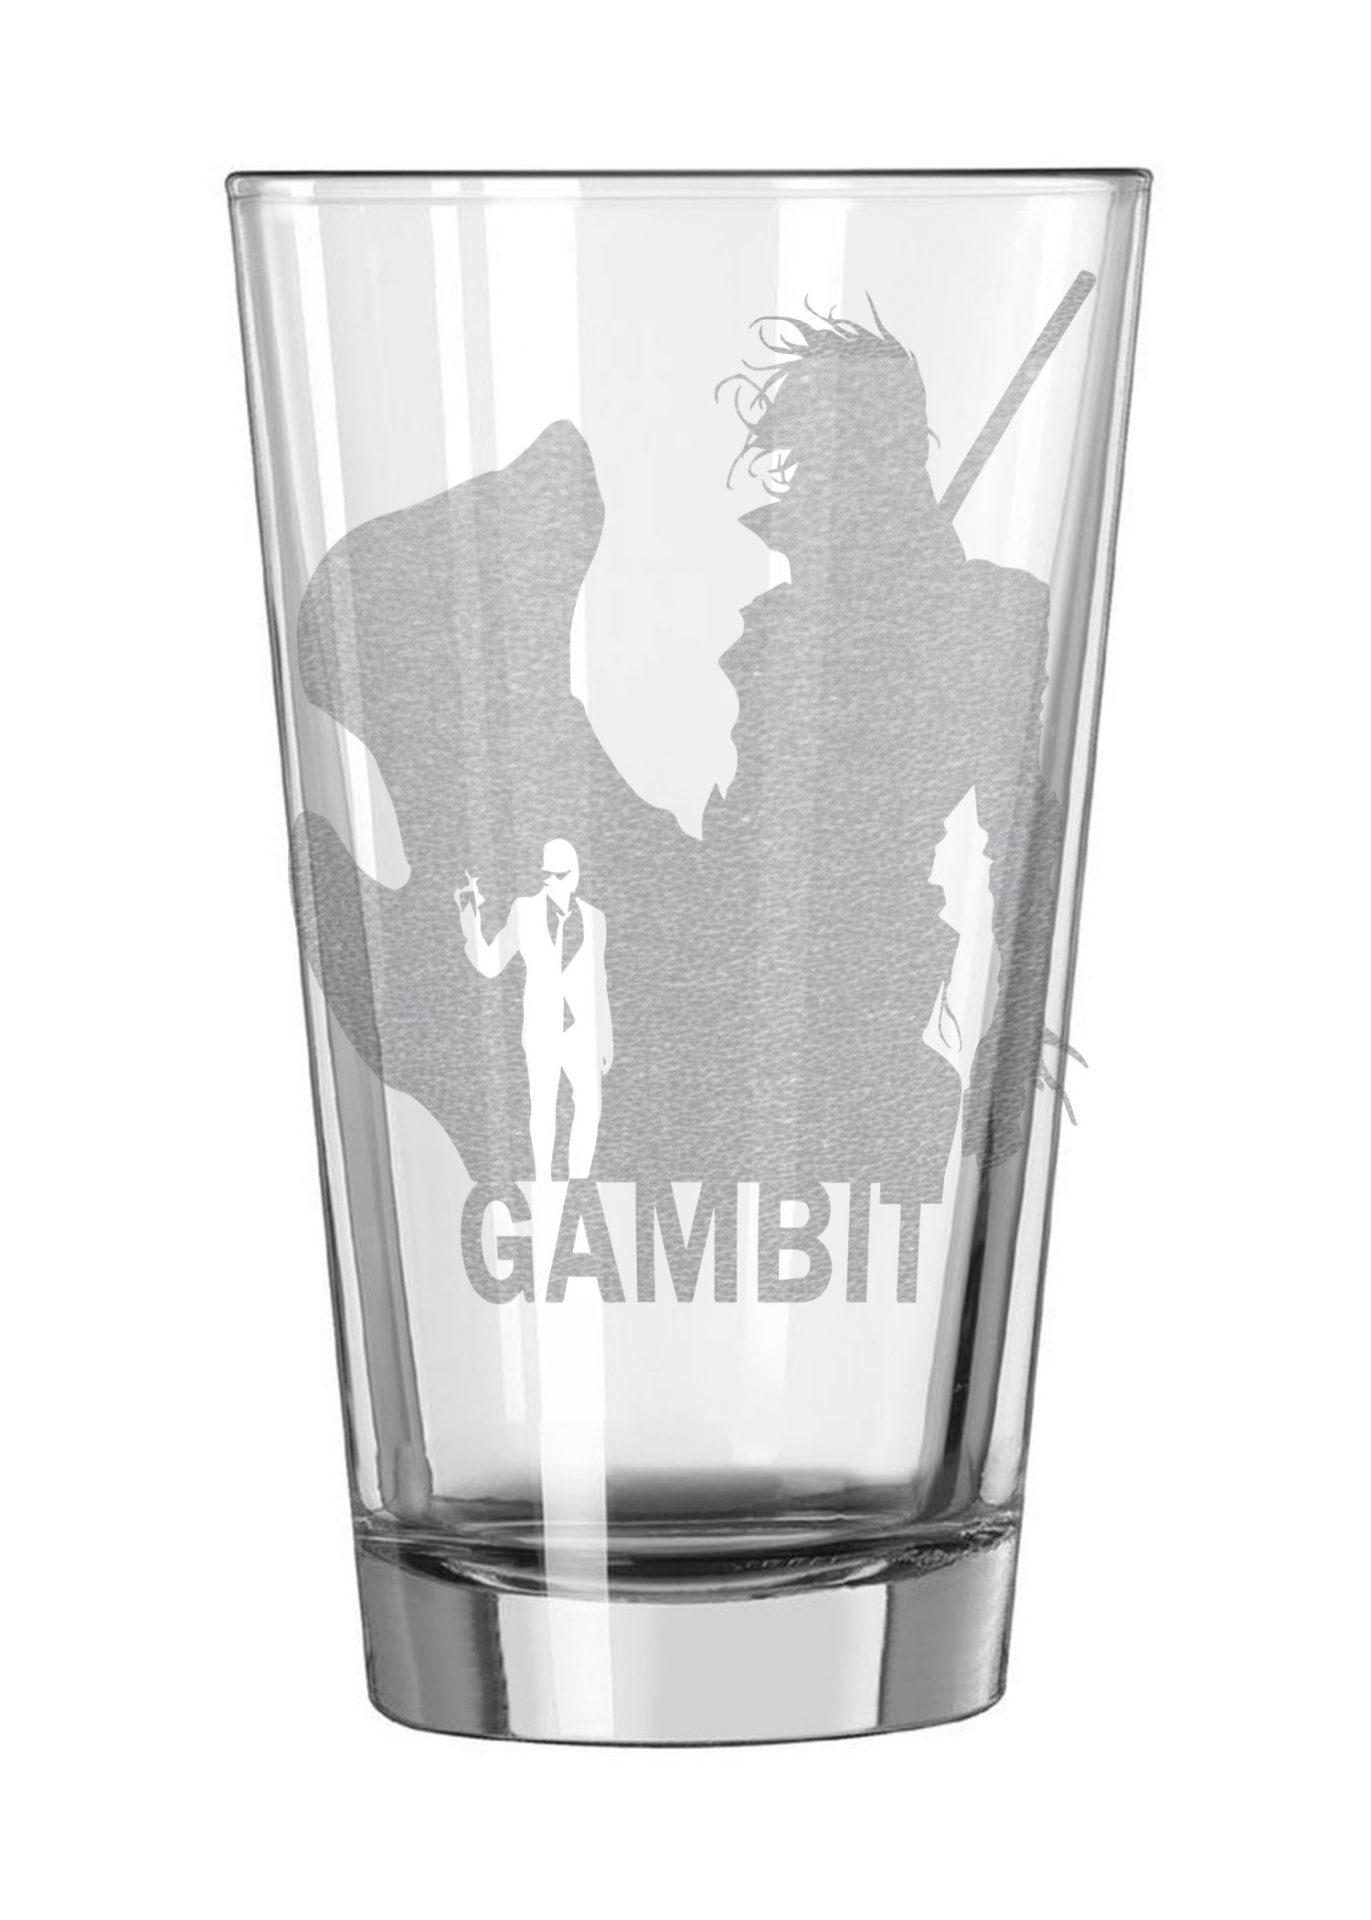 Gambit X-men Pint Glass